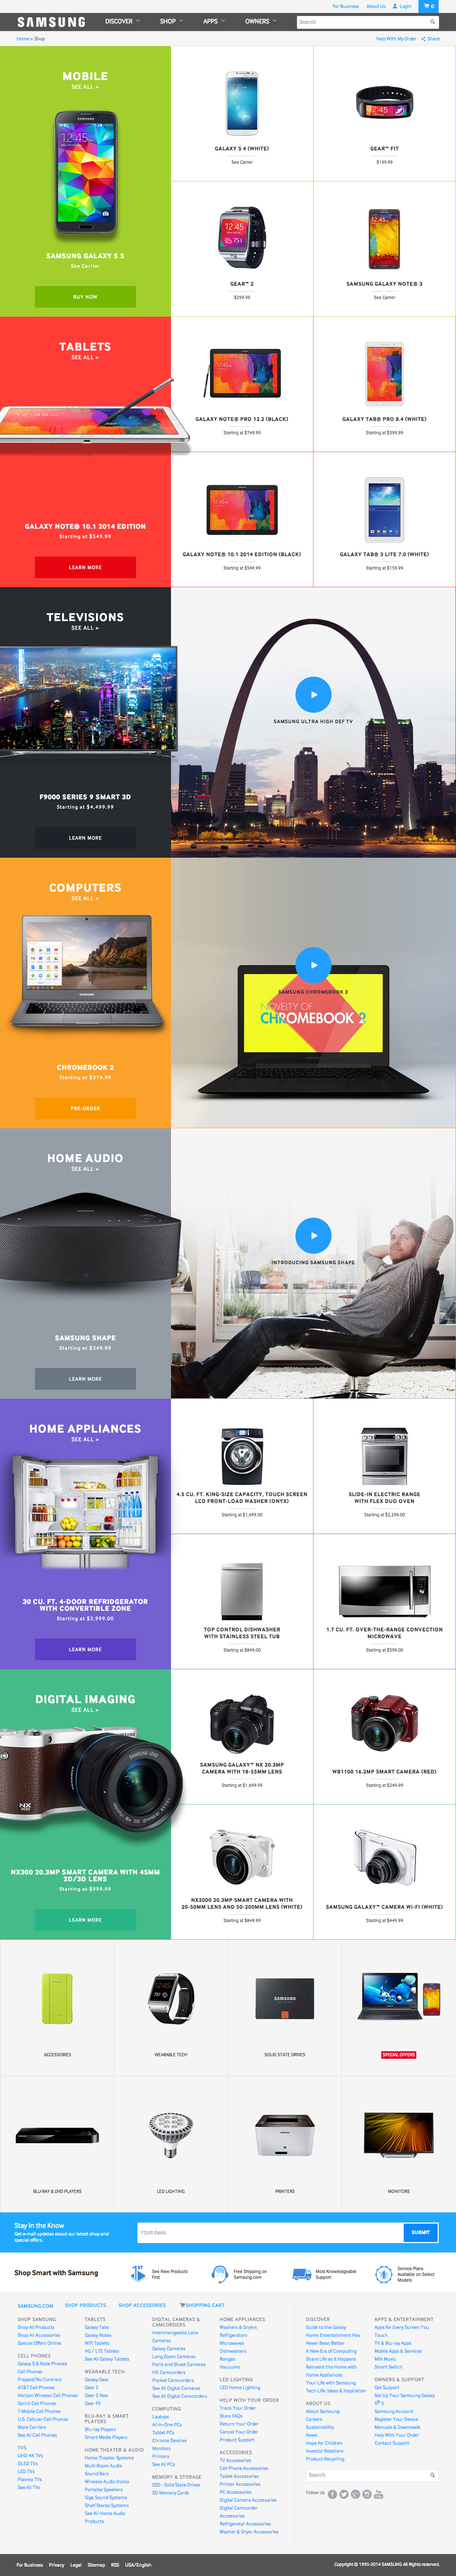 Samsung Website Design